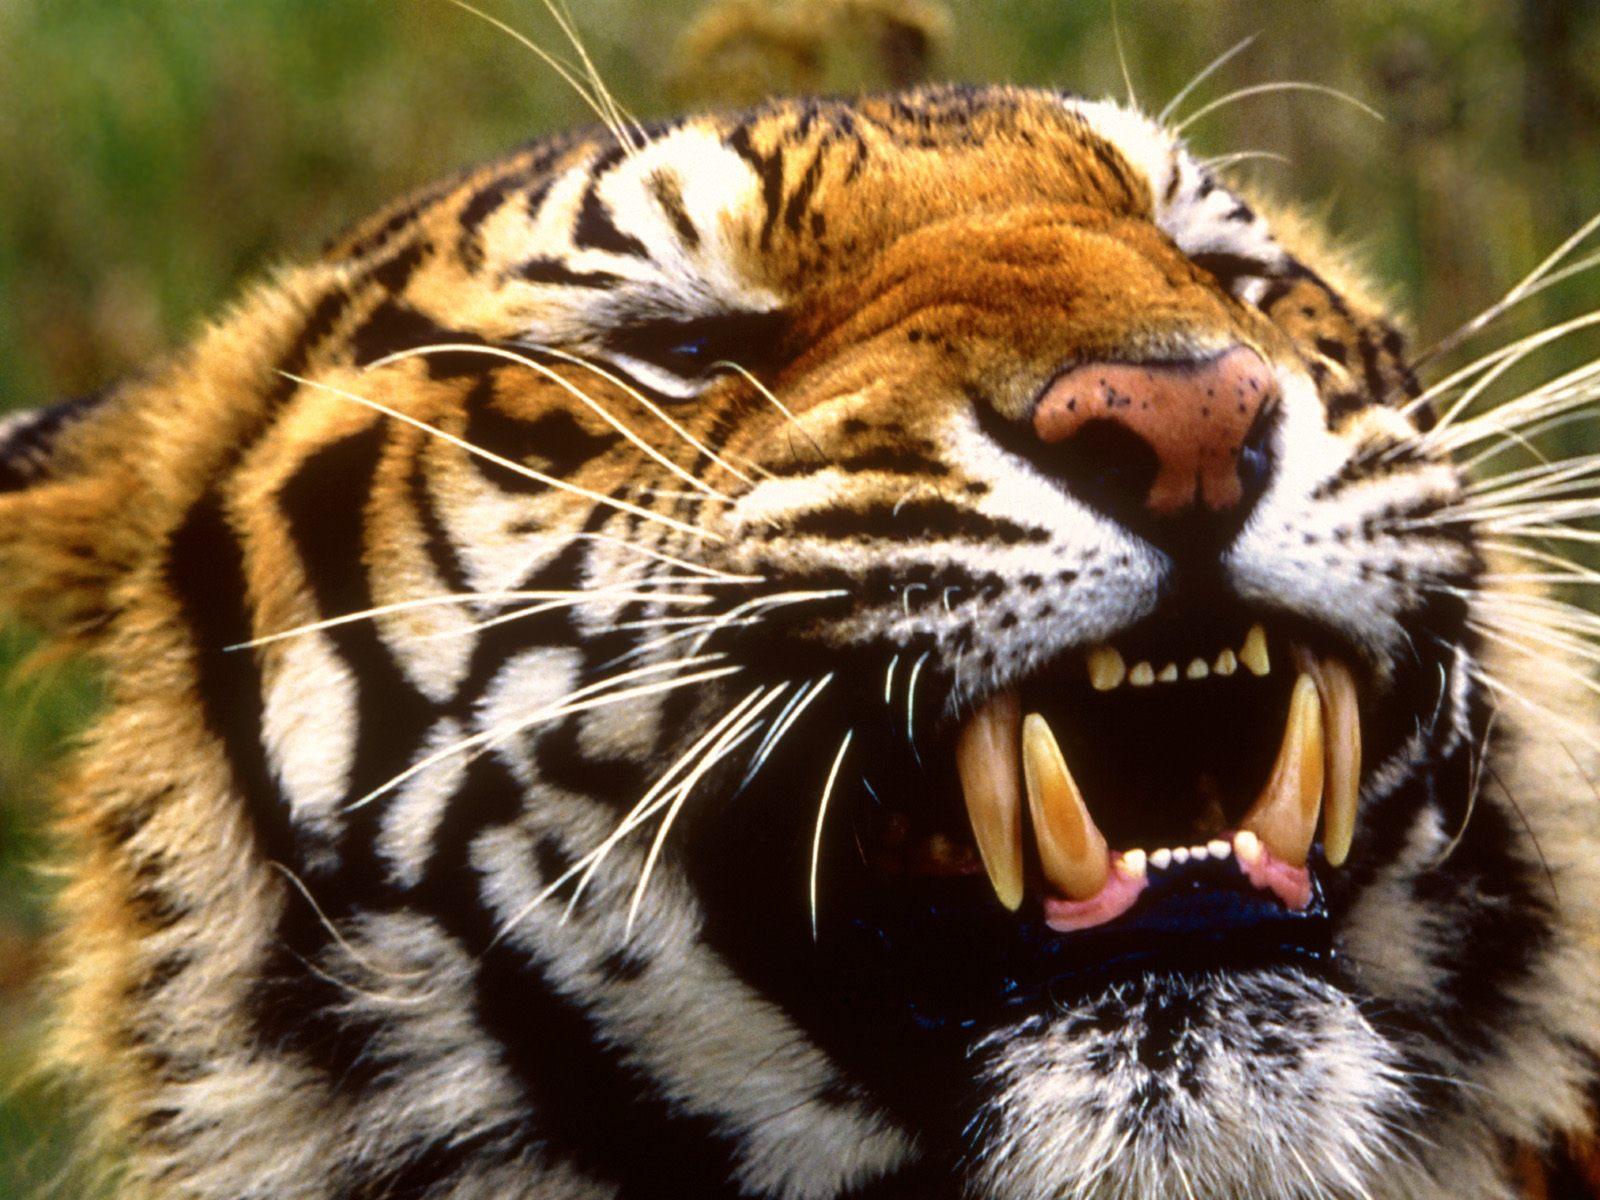 tiger wallpapers hd bengal tiger Desktop wallpaper Tiger wallpapers hd